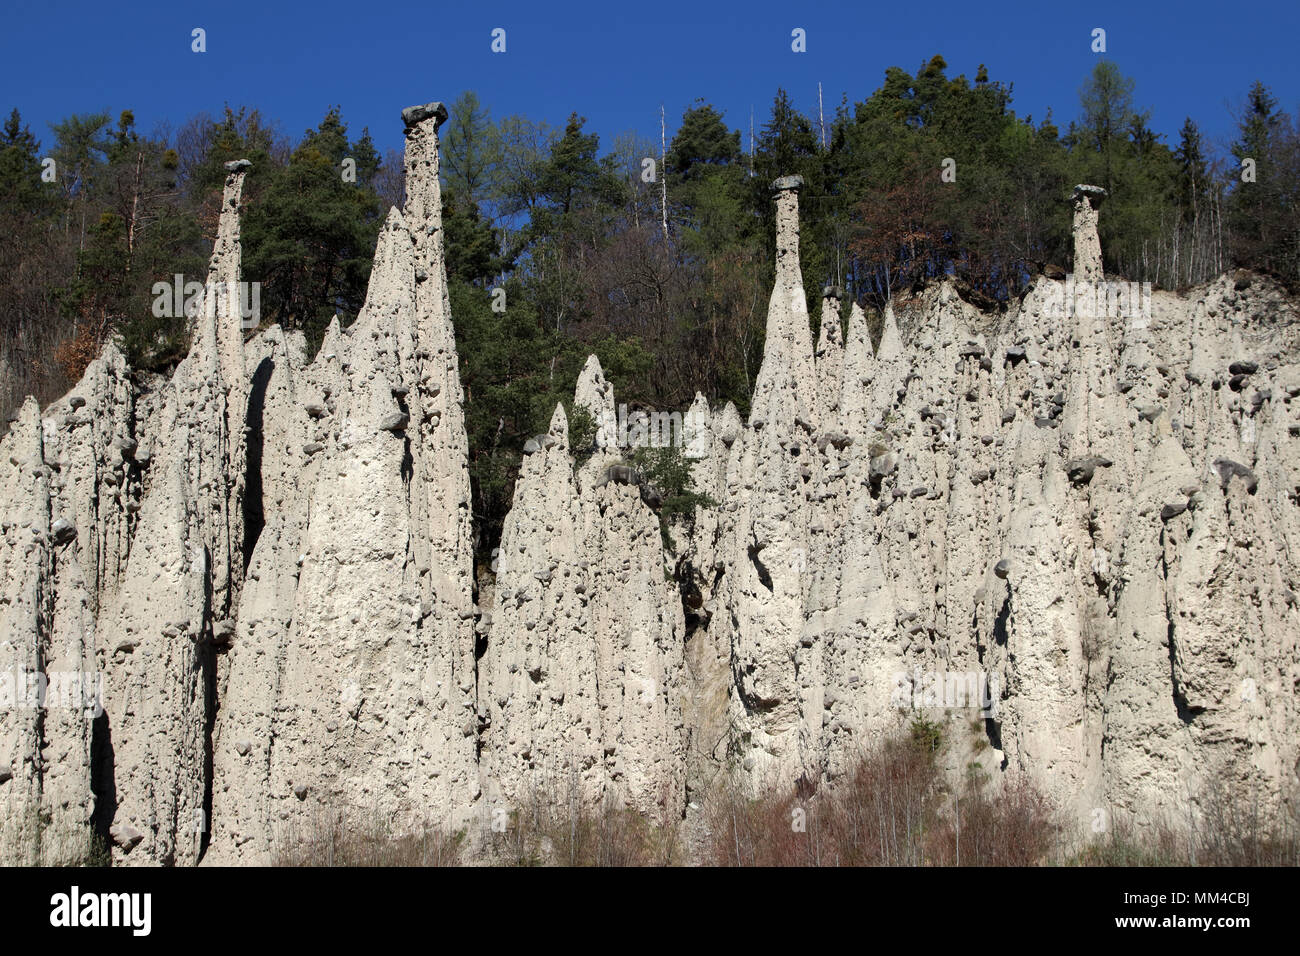 Erdpyramiden Gasteinergraben Unterinn Ritten Südtirol Alto Adige Italien Europa Stockfoto